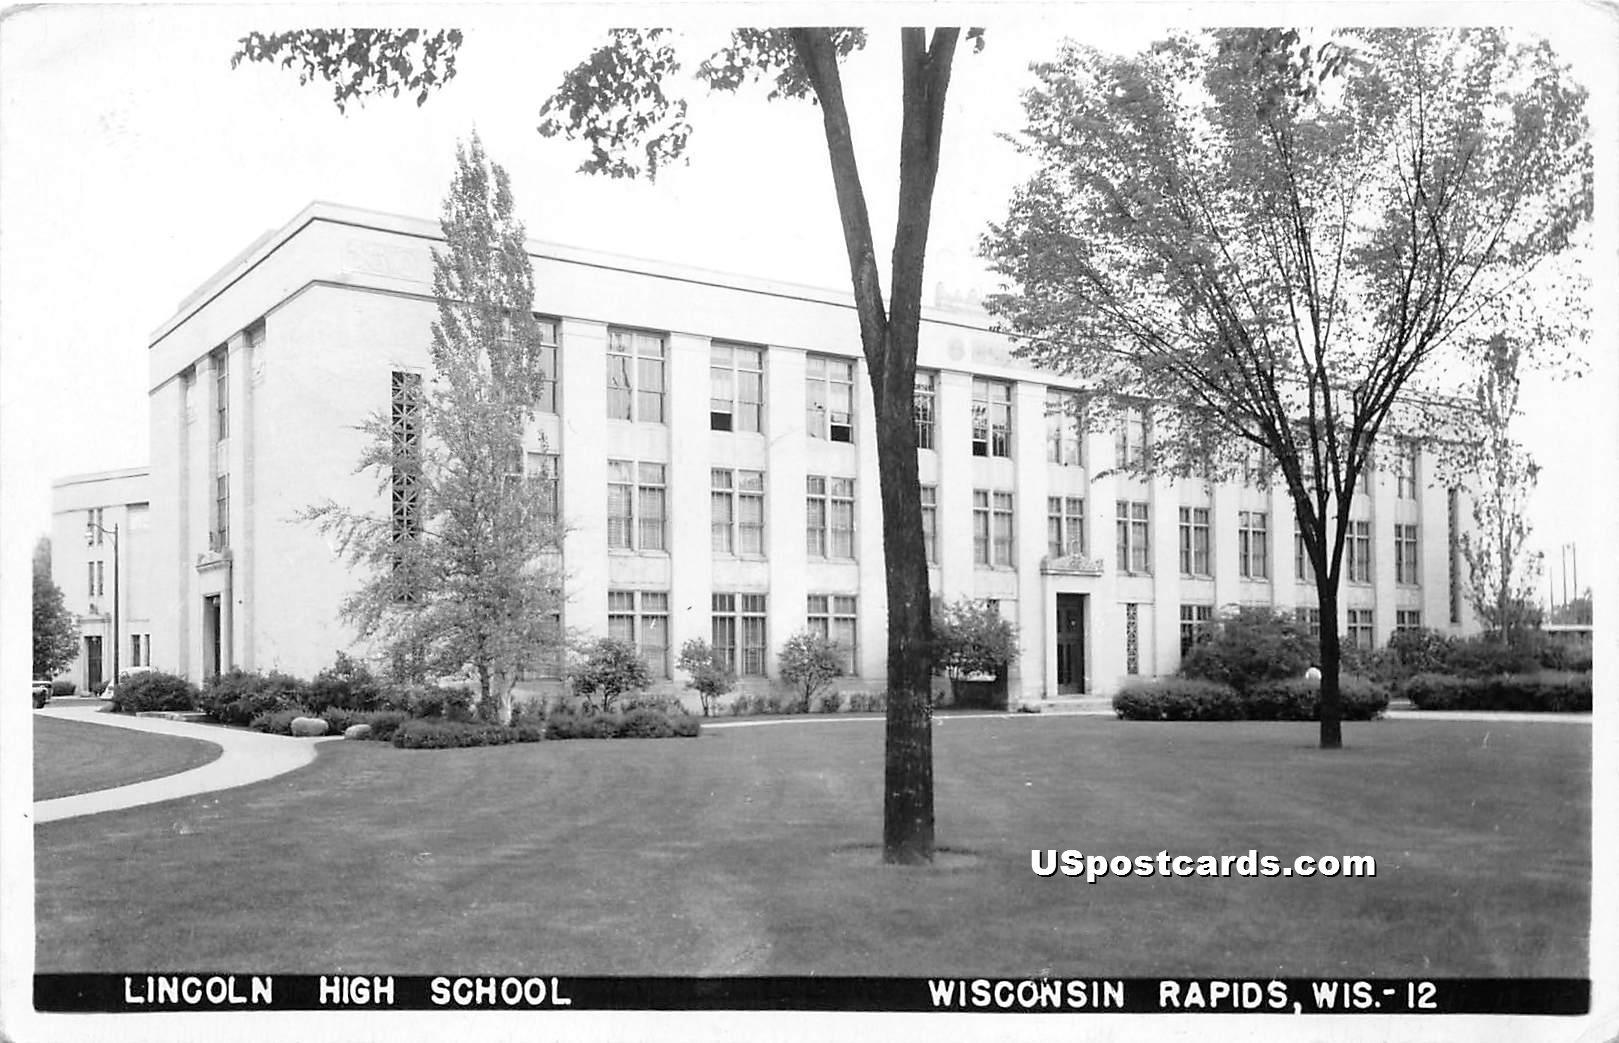 Llincoln High School - Wisconsin Rapids Postcards, Wisconsin WI Postcard